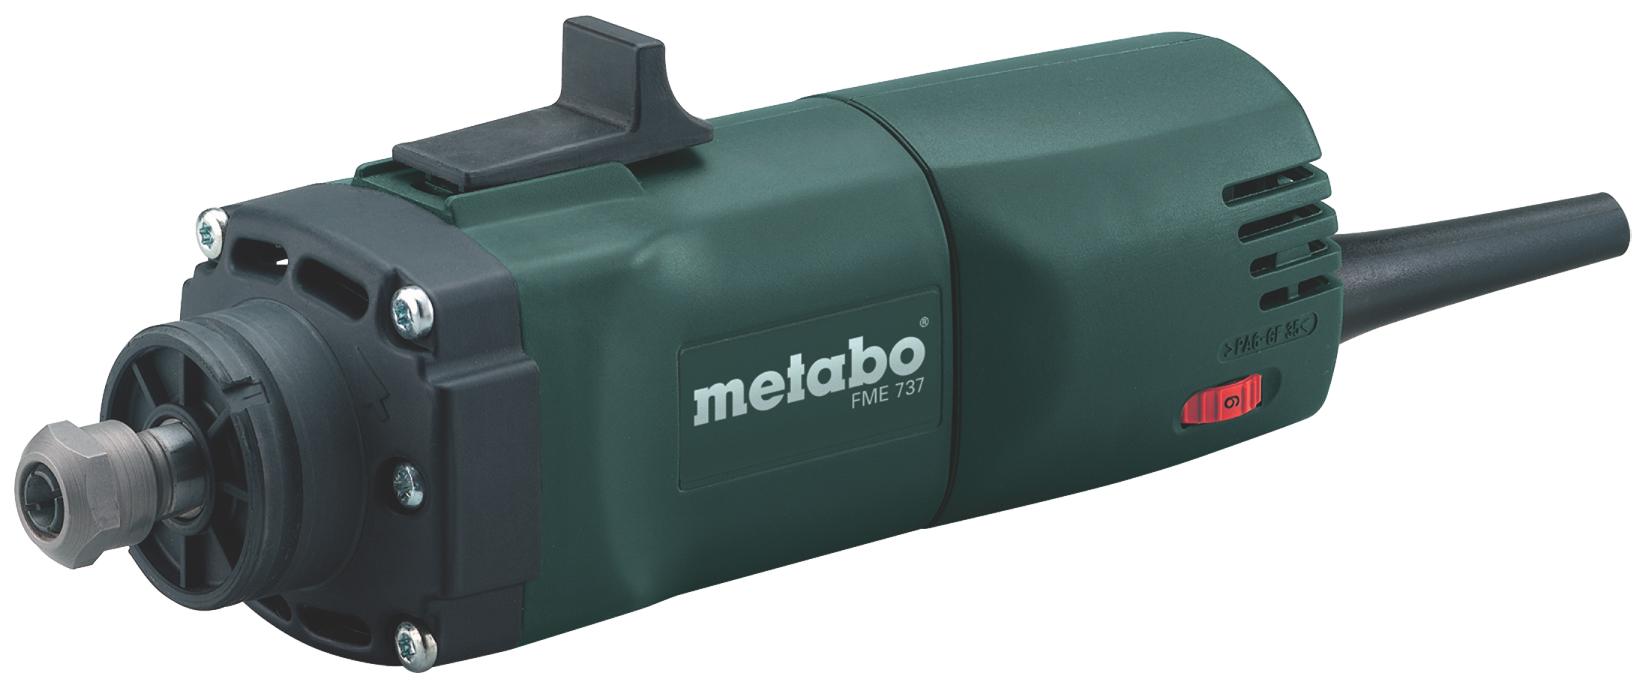 Кромочный фрезер Metabo Fme 737